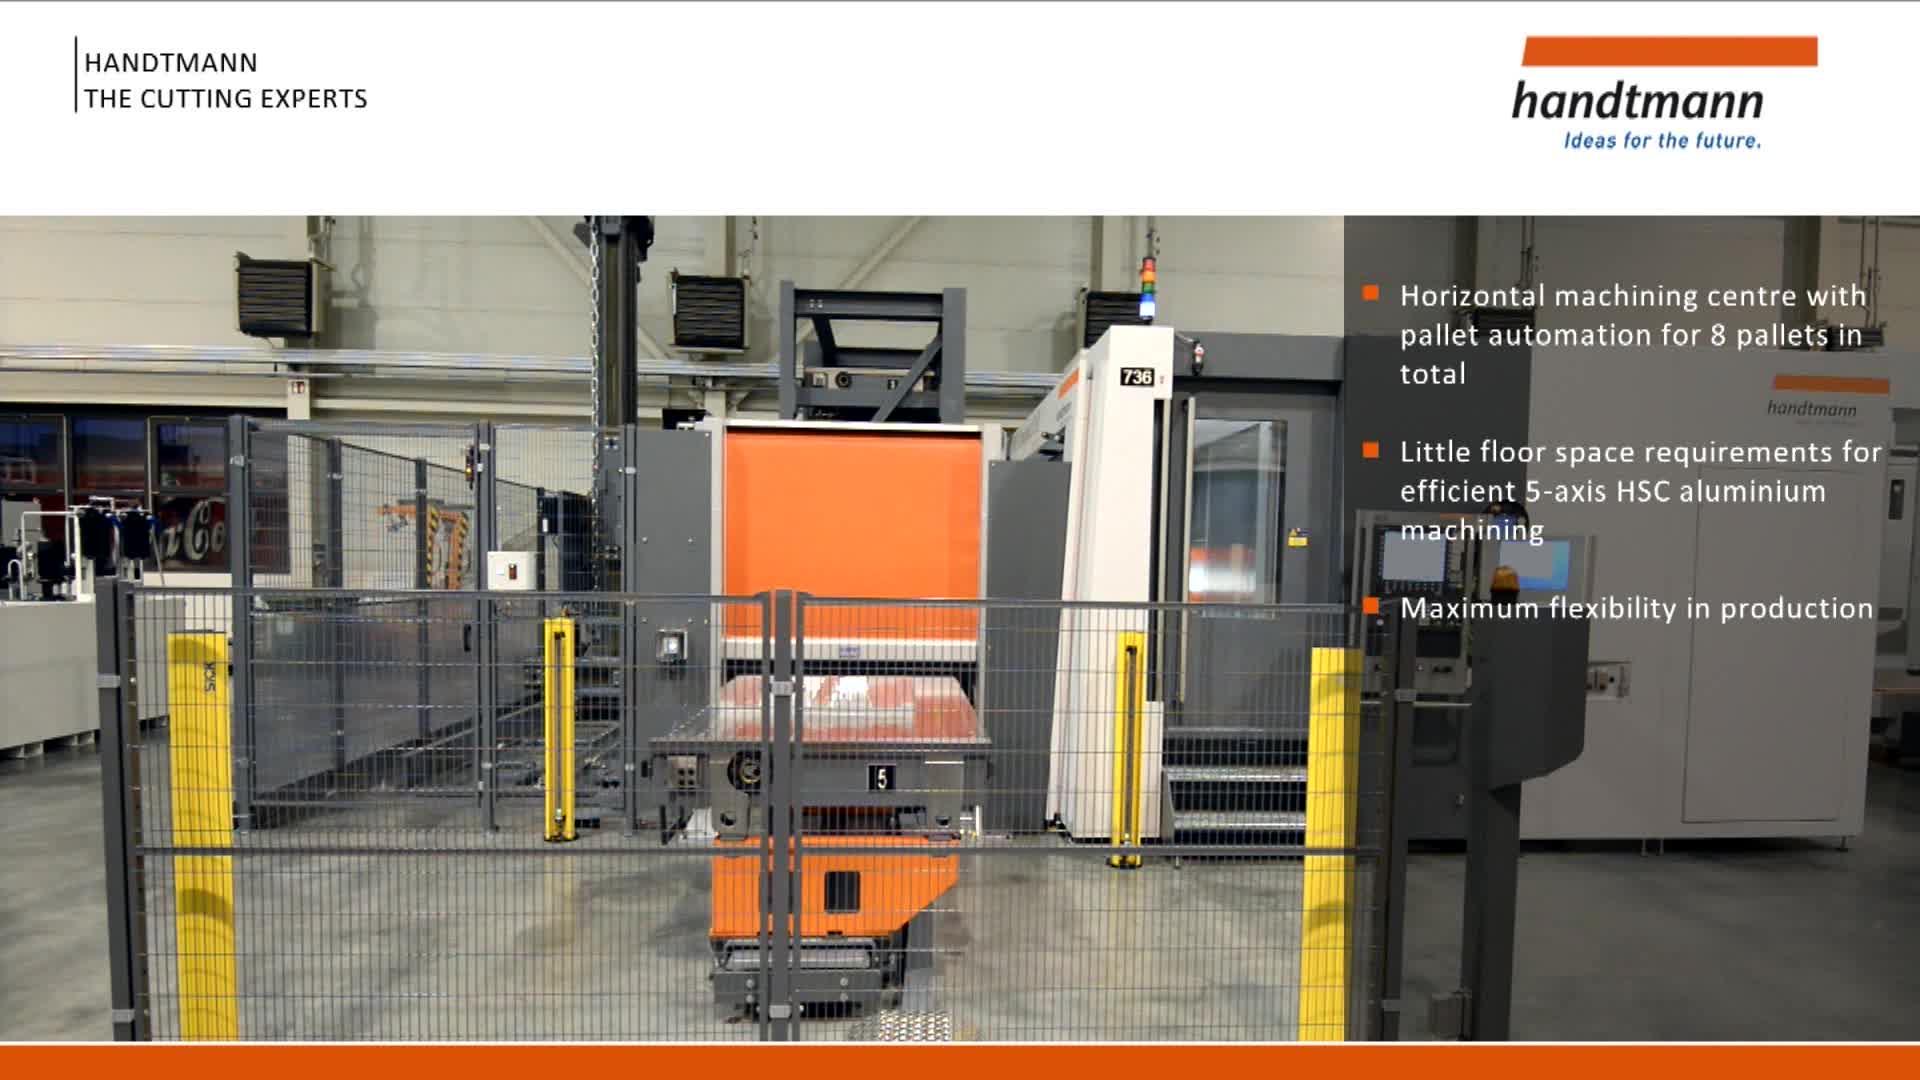 Handtmann HBZ CC pallet automation system with pallet rack